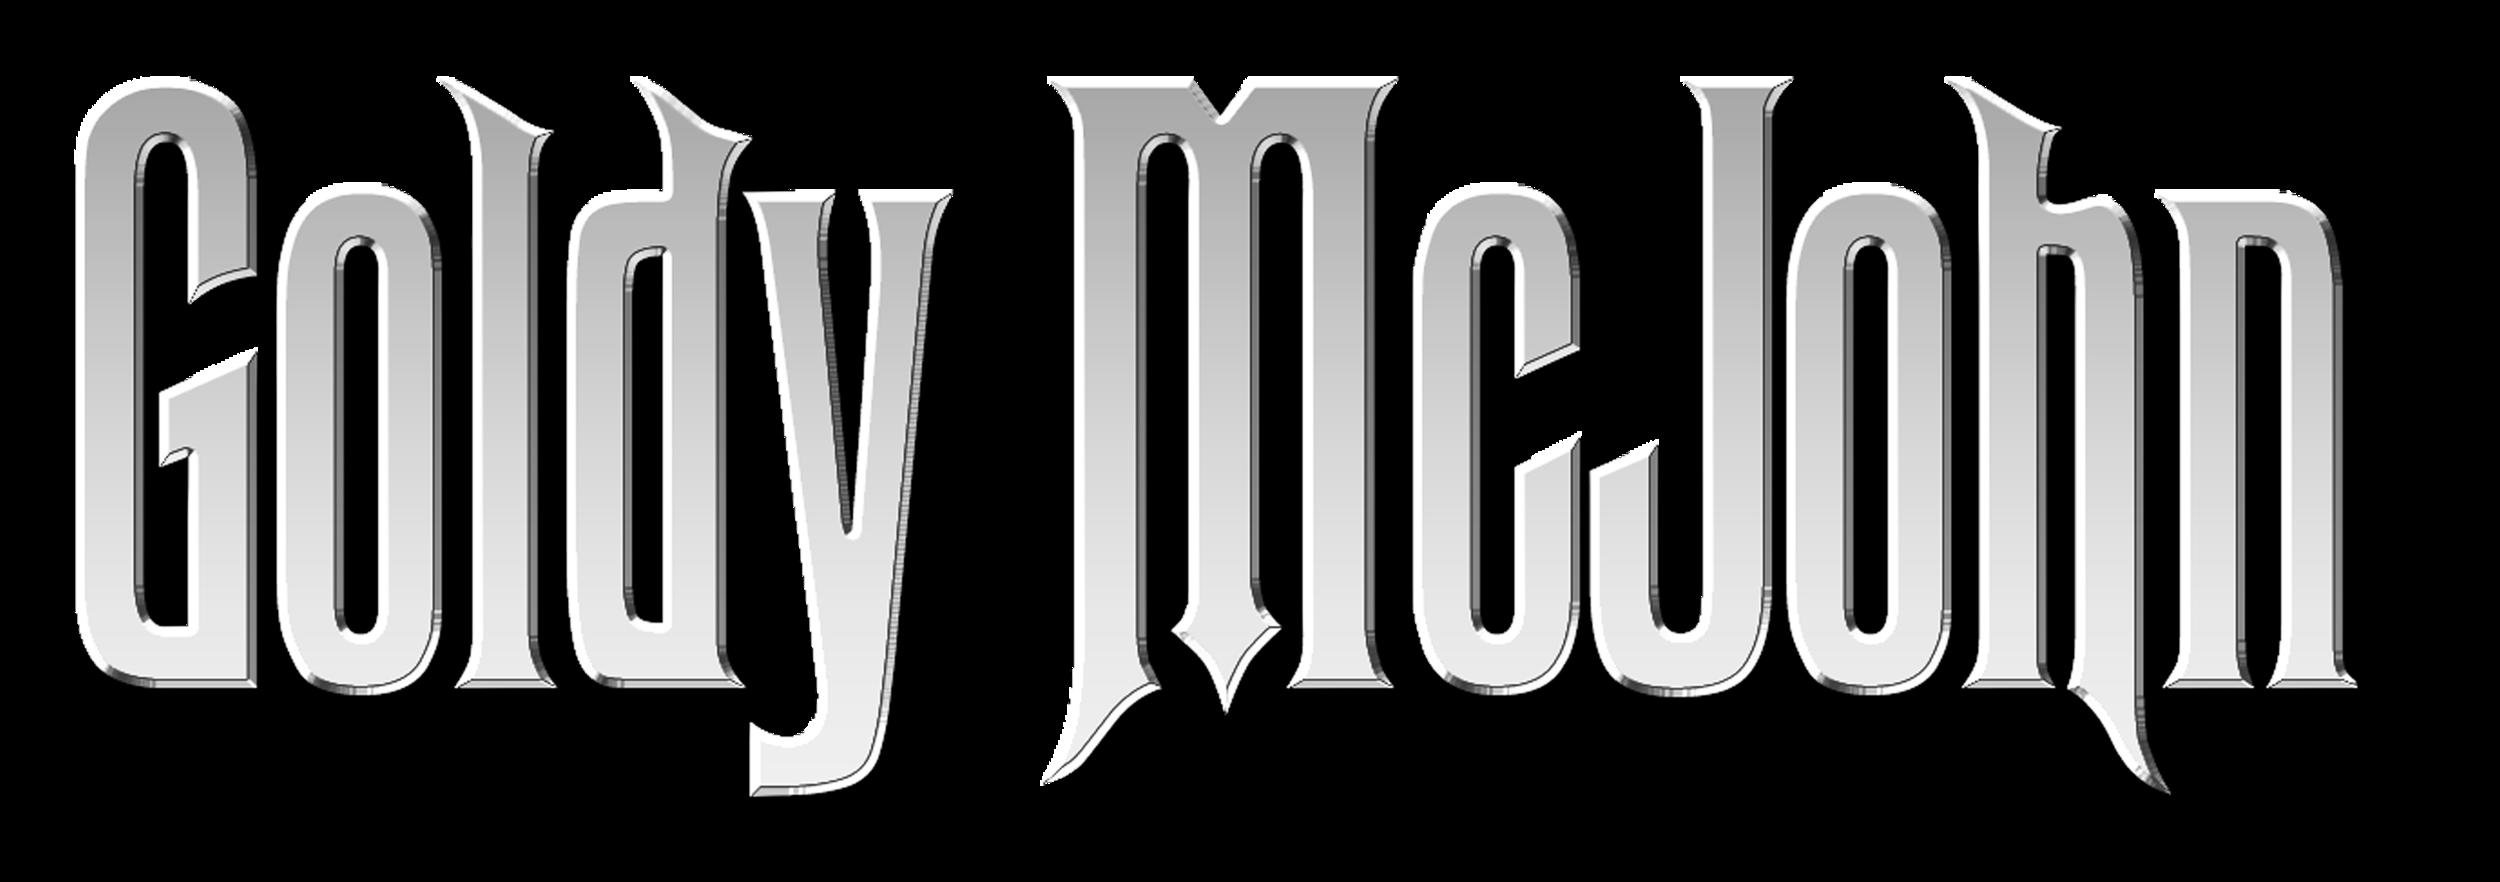 Goldy McJohn.png